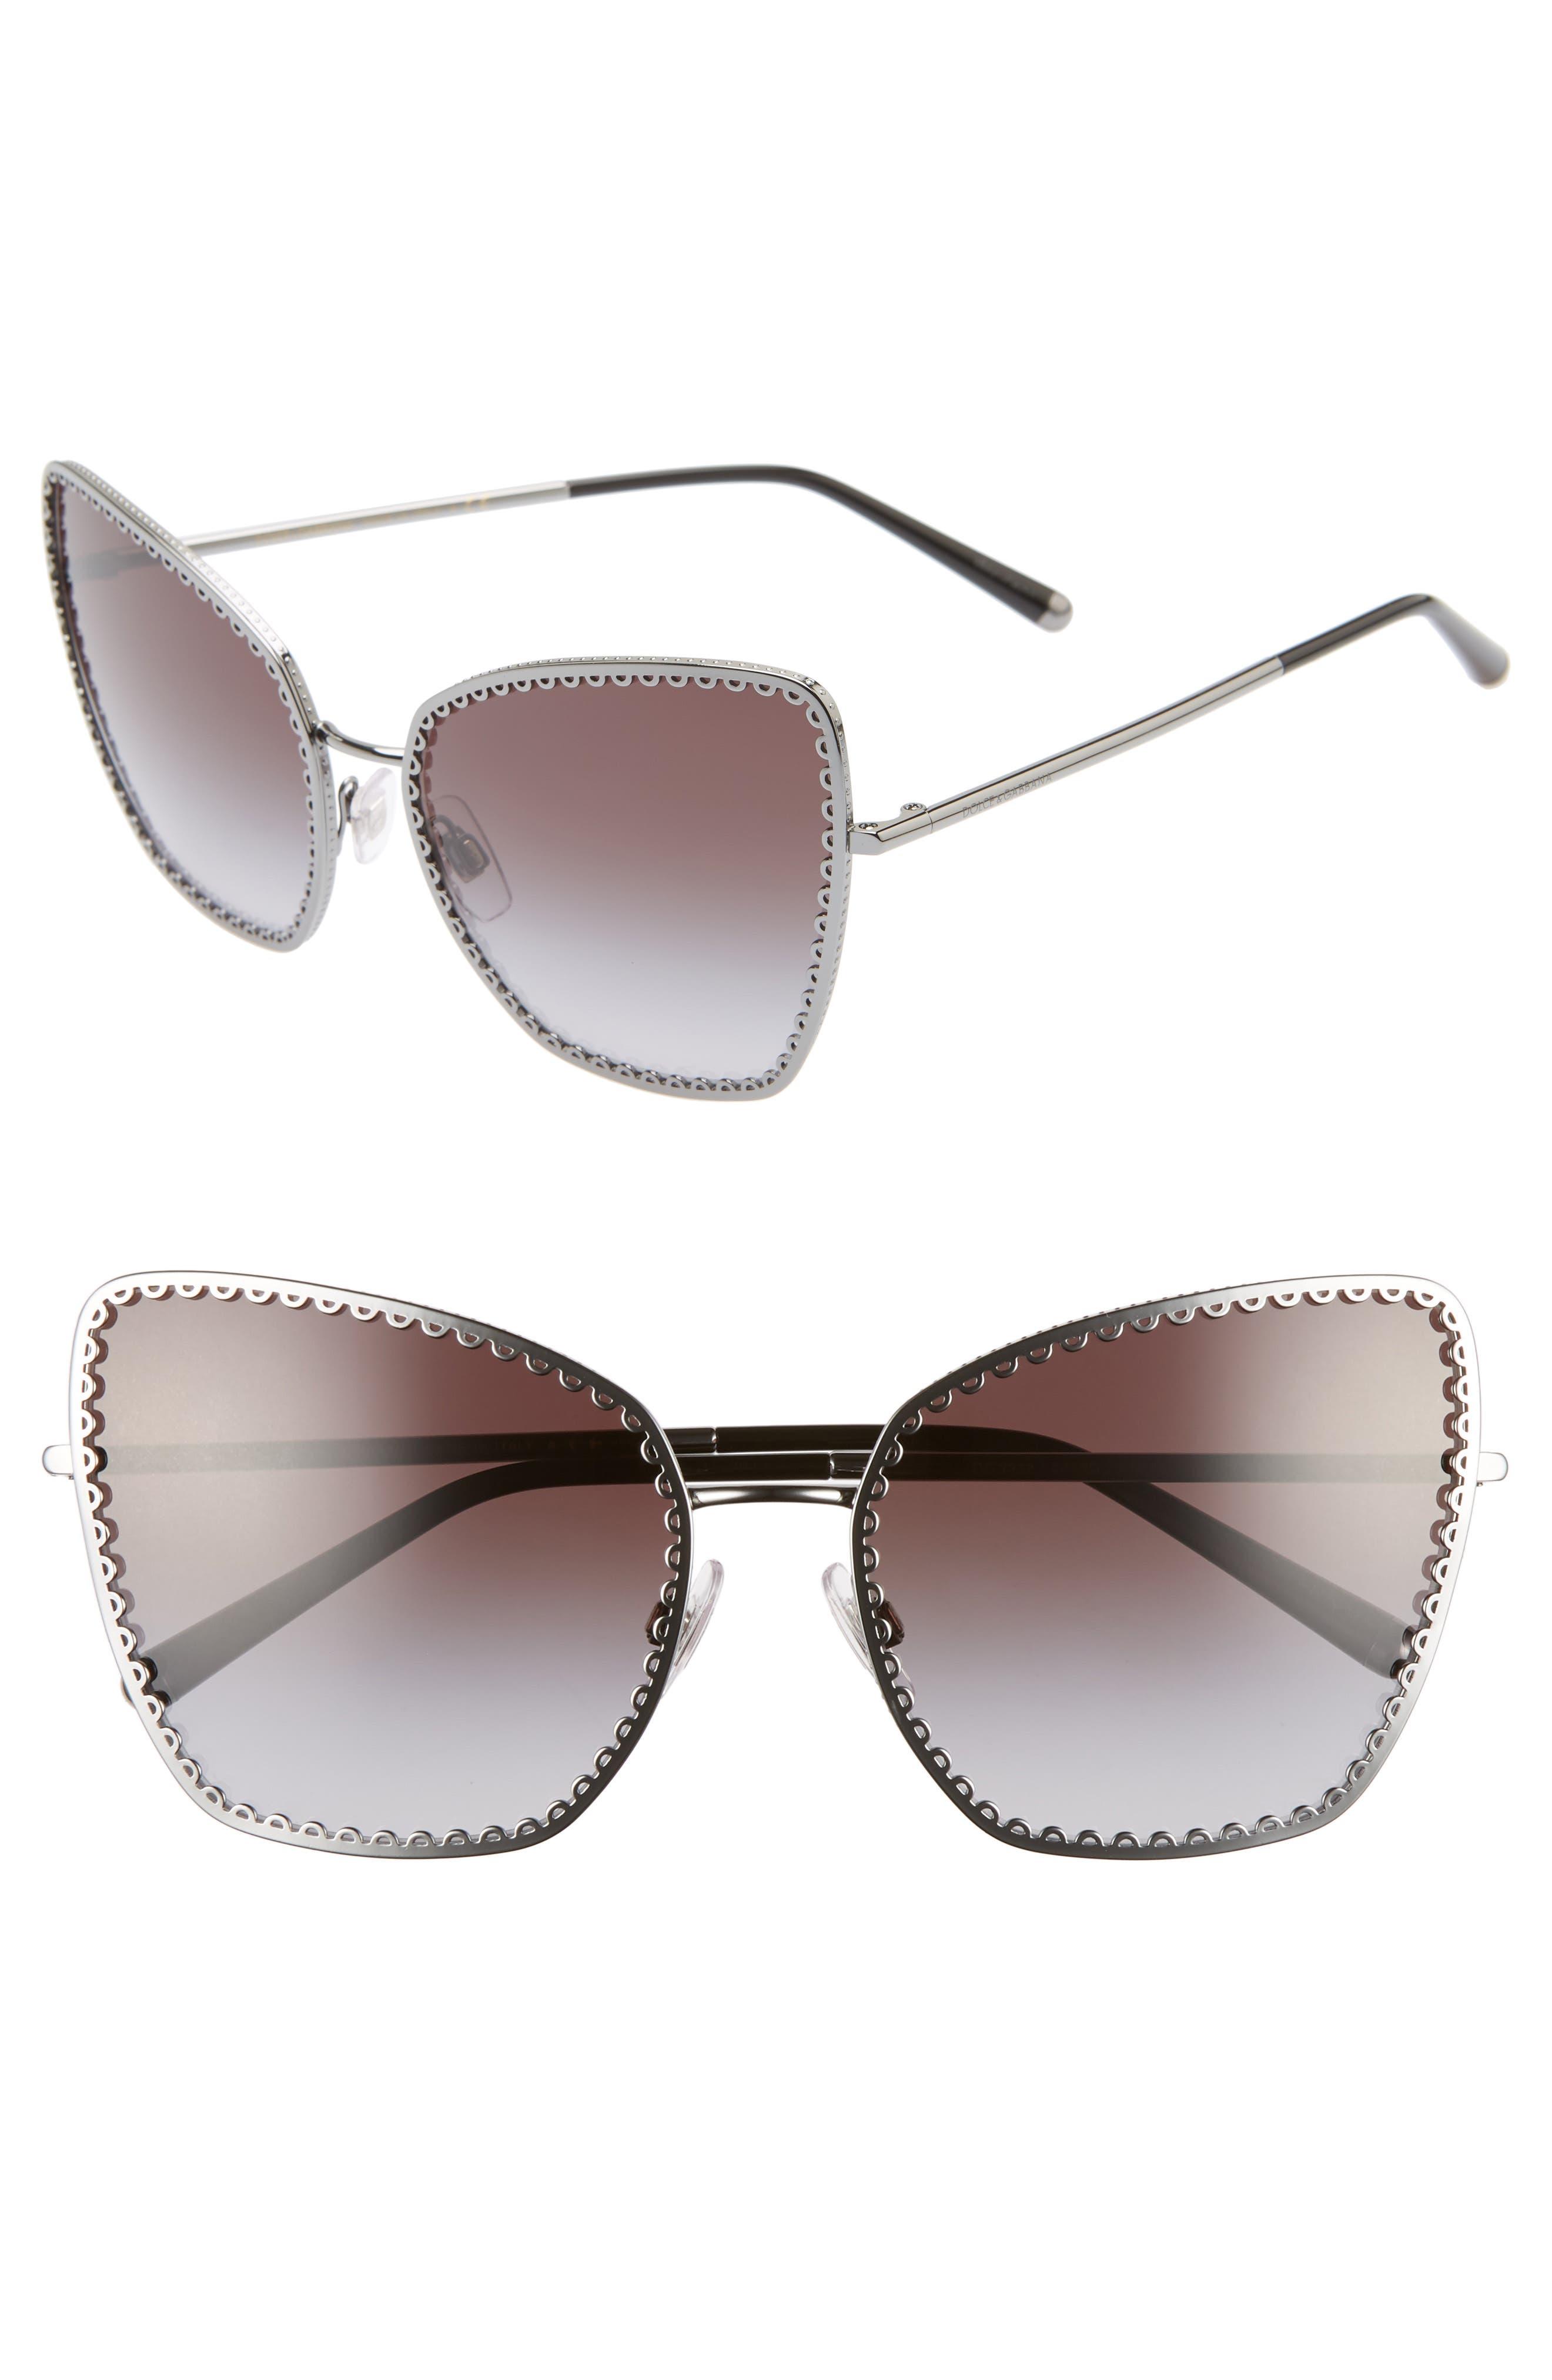 Sacred Heart 61mm Gradient Cat Eye Sunglasses,                             Main thumbnail 1, color,                             GUNMETAL GRADIENT